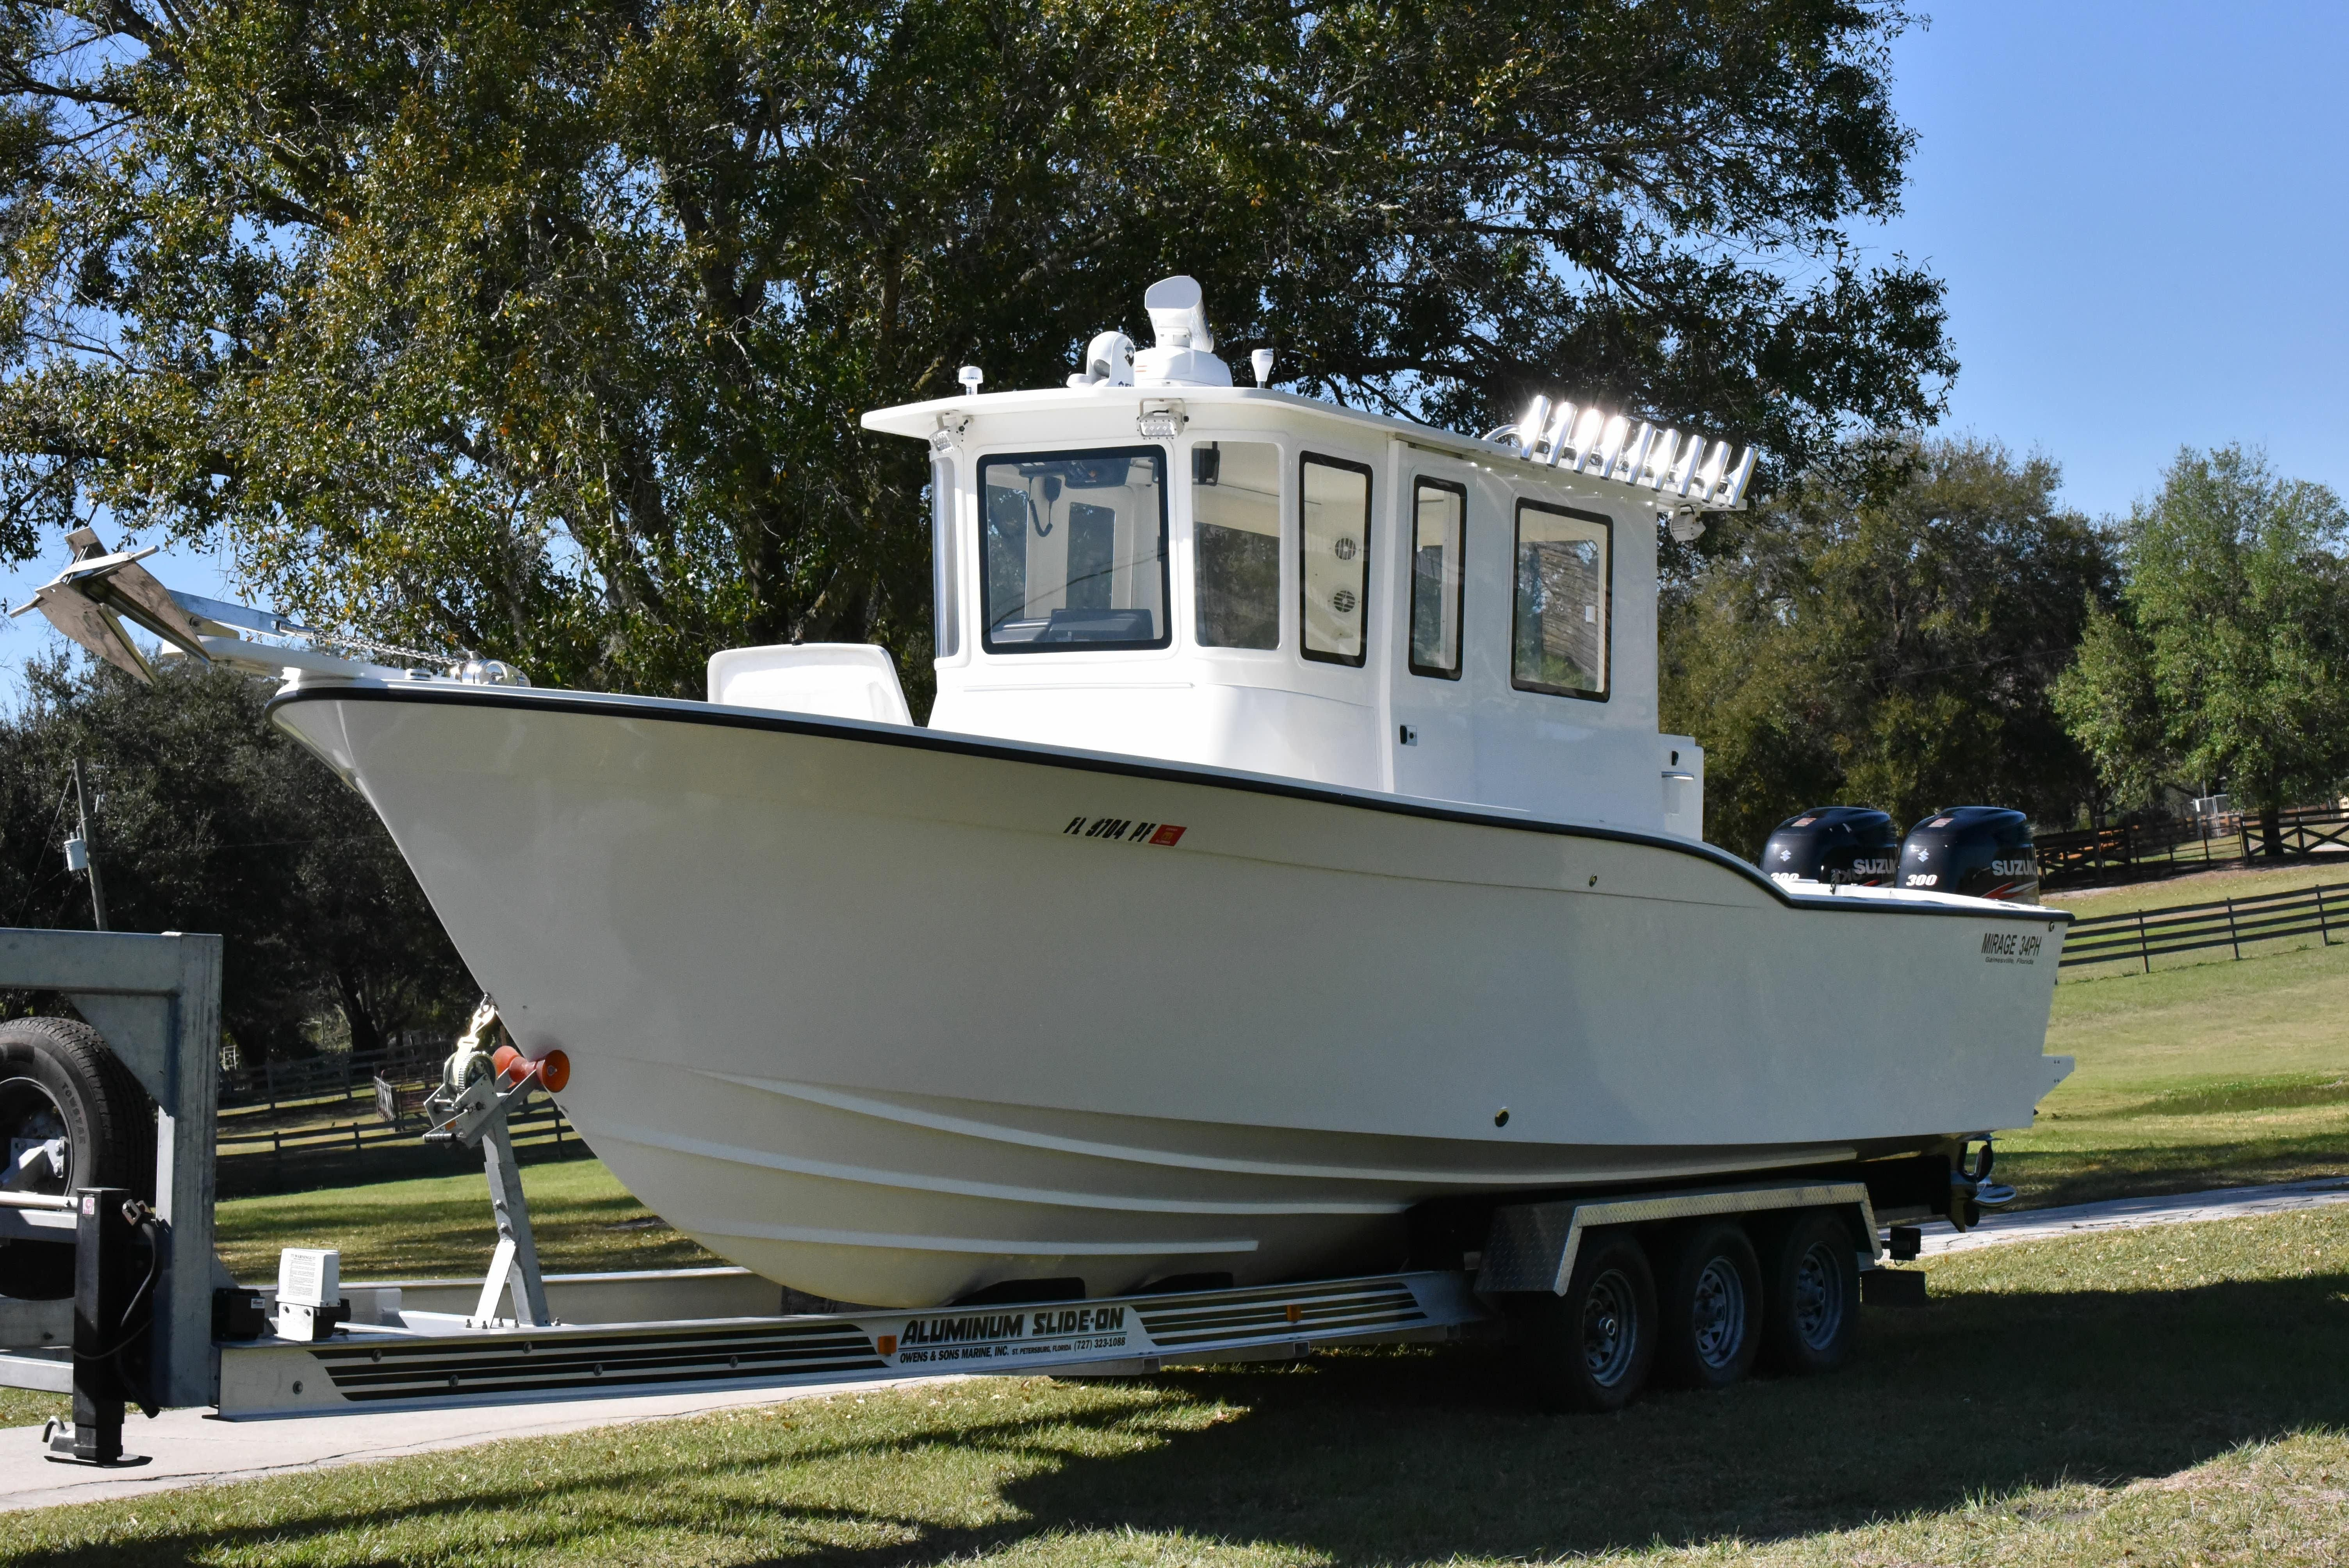 2011 mirage yachts pilot house power boat for sale. Black Bedroom Furniture Sets. Home Design Ideas